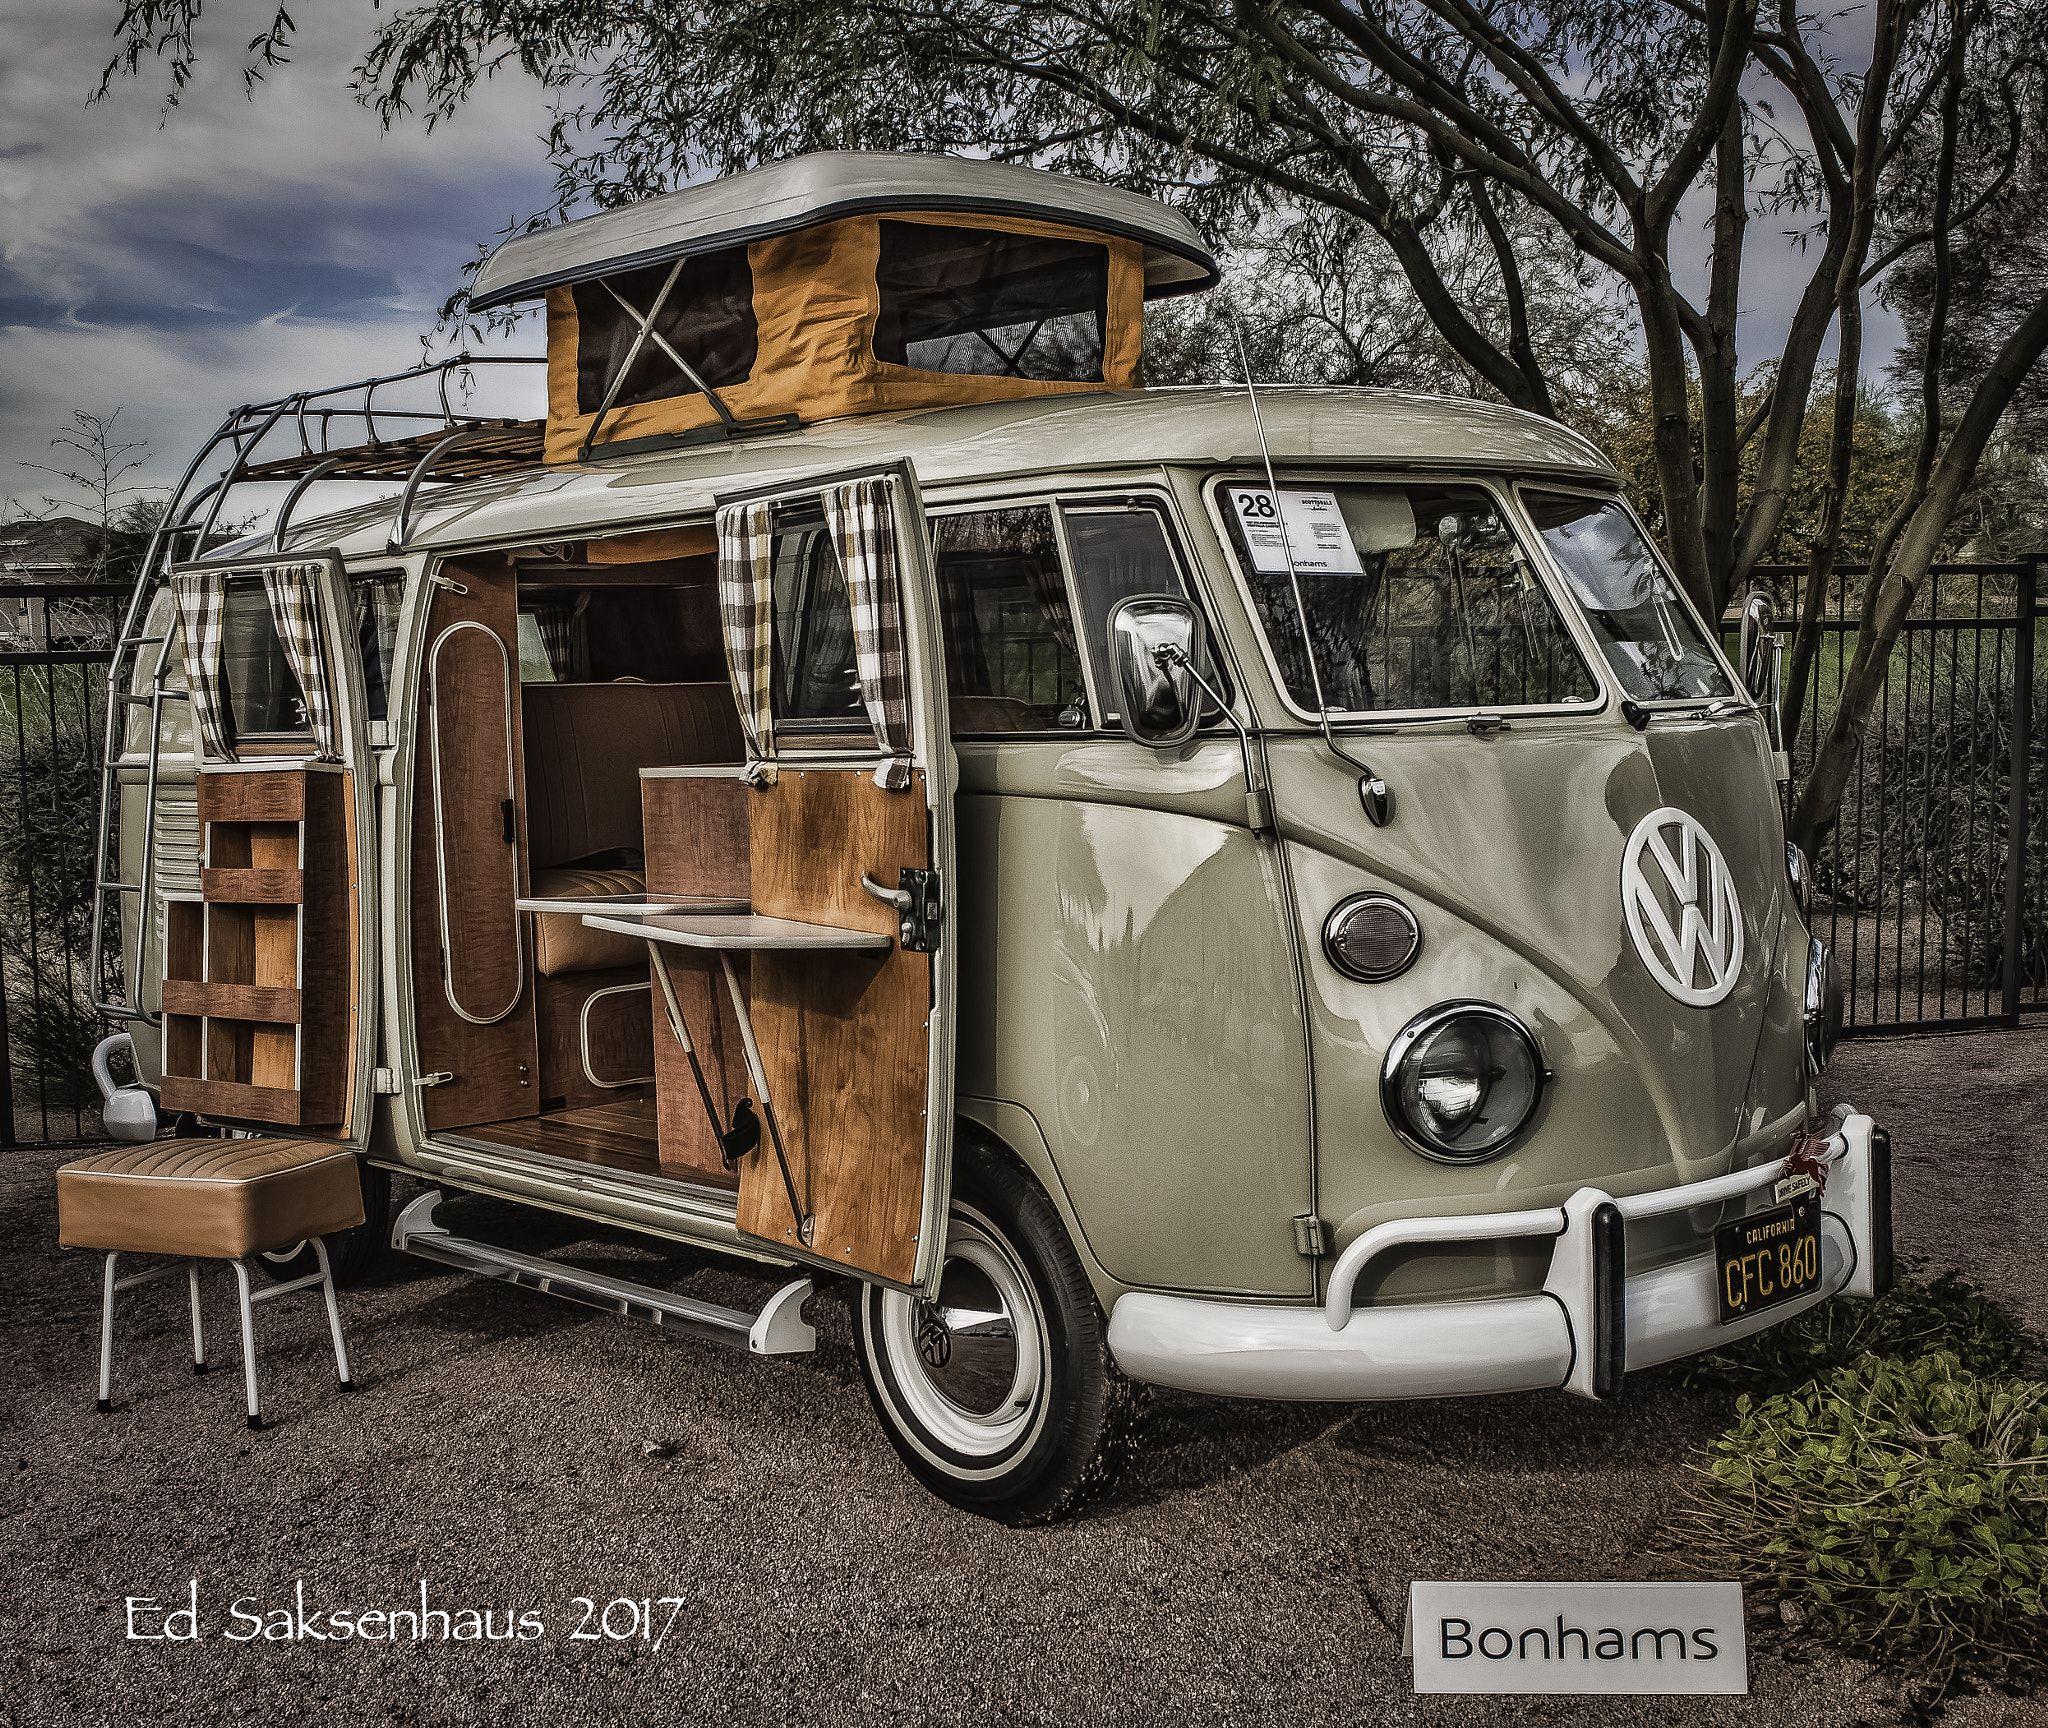 Vw Bus Vw Camper Bus Vintage Vw Bus Vw Bus Camper Vw Bus Interior